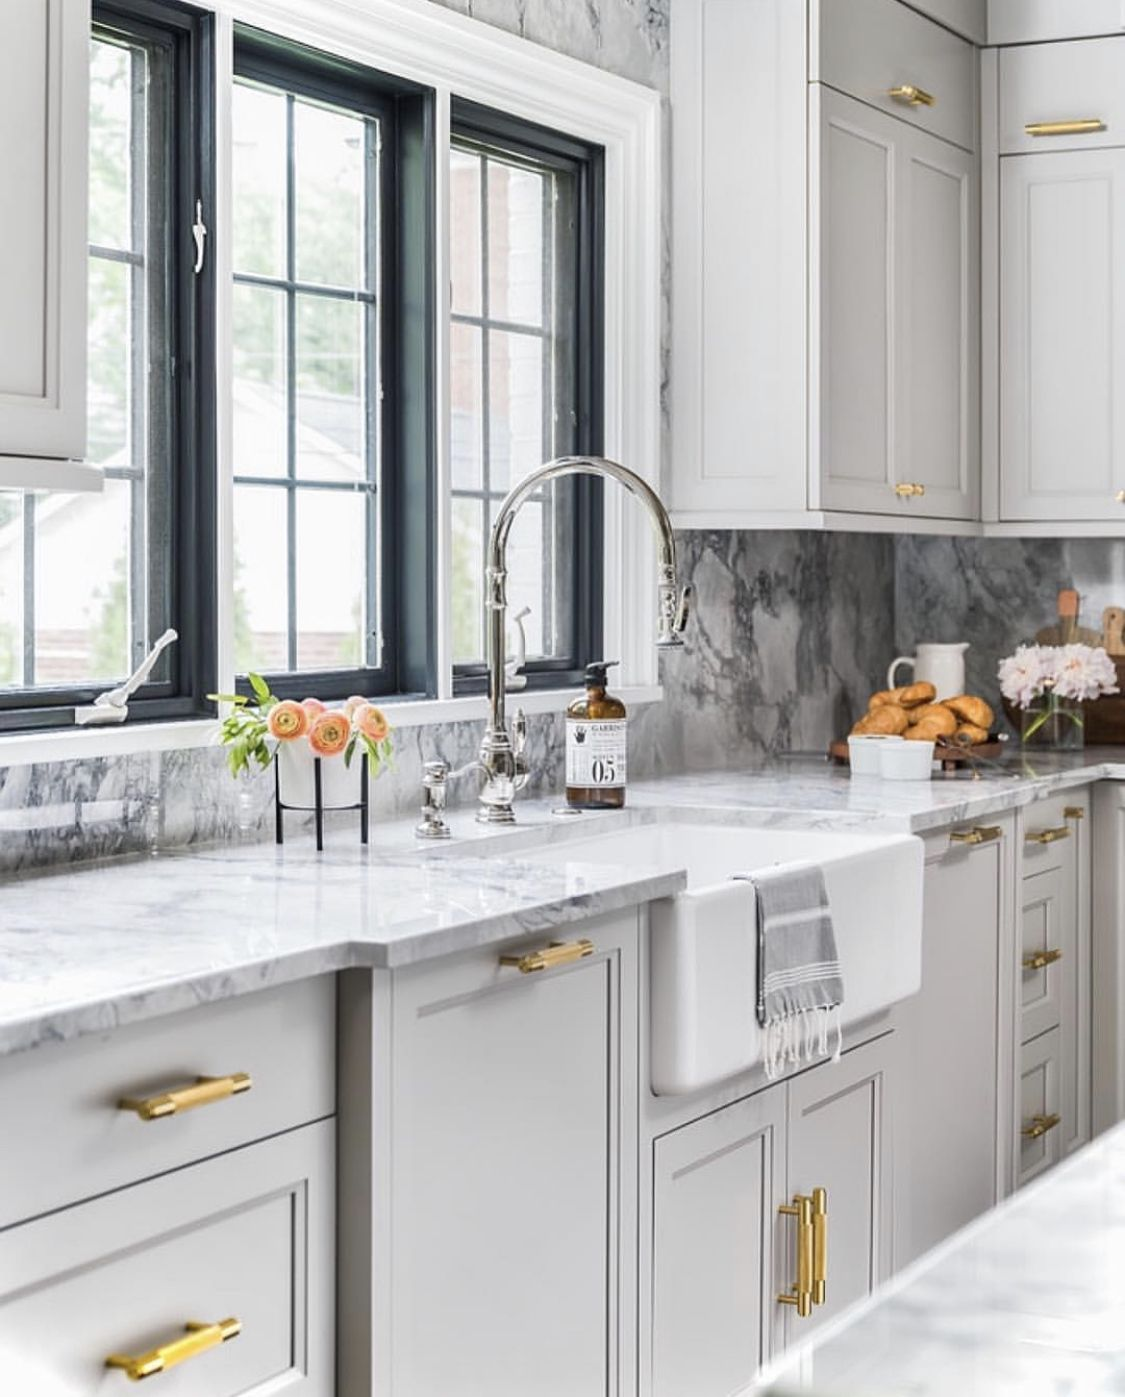 Seamless Counter And Backsplash Grey Shaker Kitchen Light Grey Kitchens Kitchen Renovation